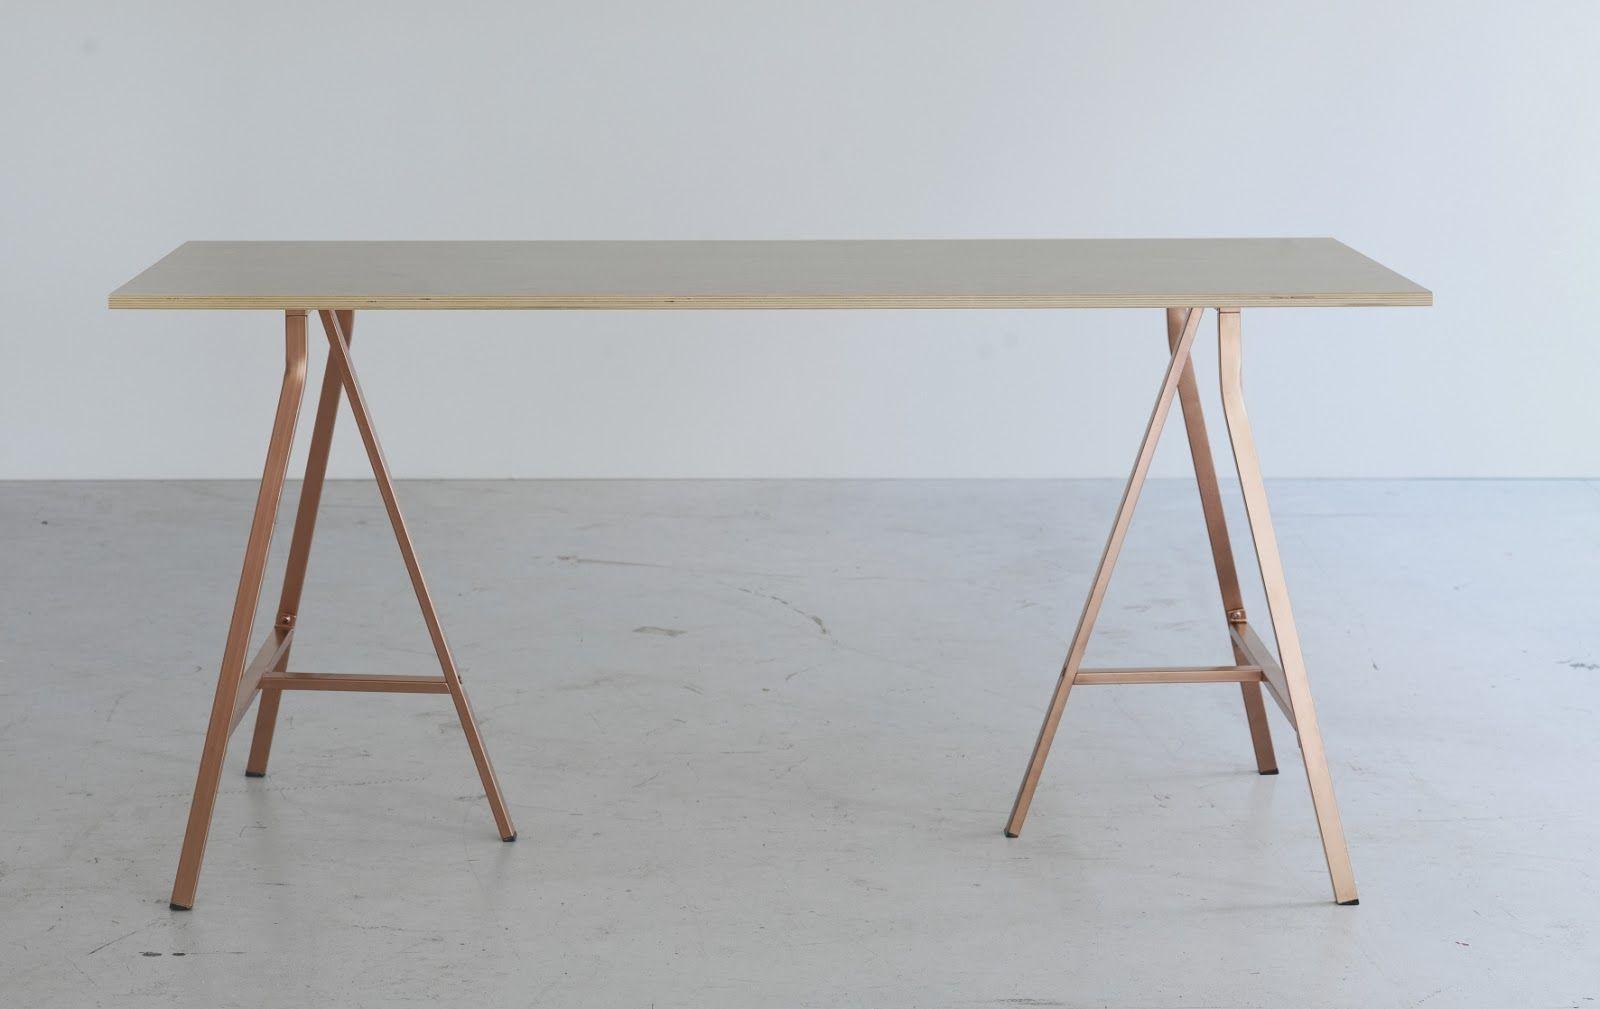 Unique Ikea Sawhorse Table Legs